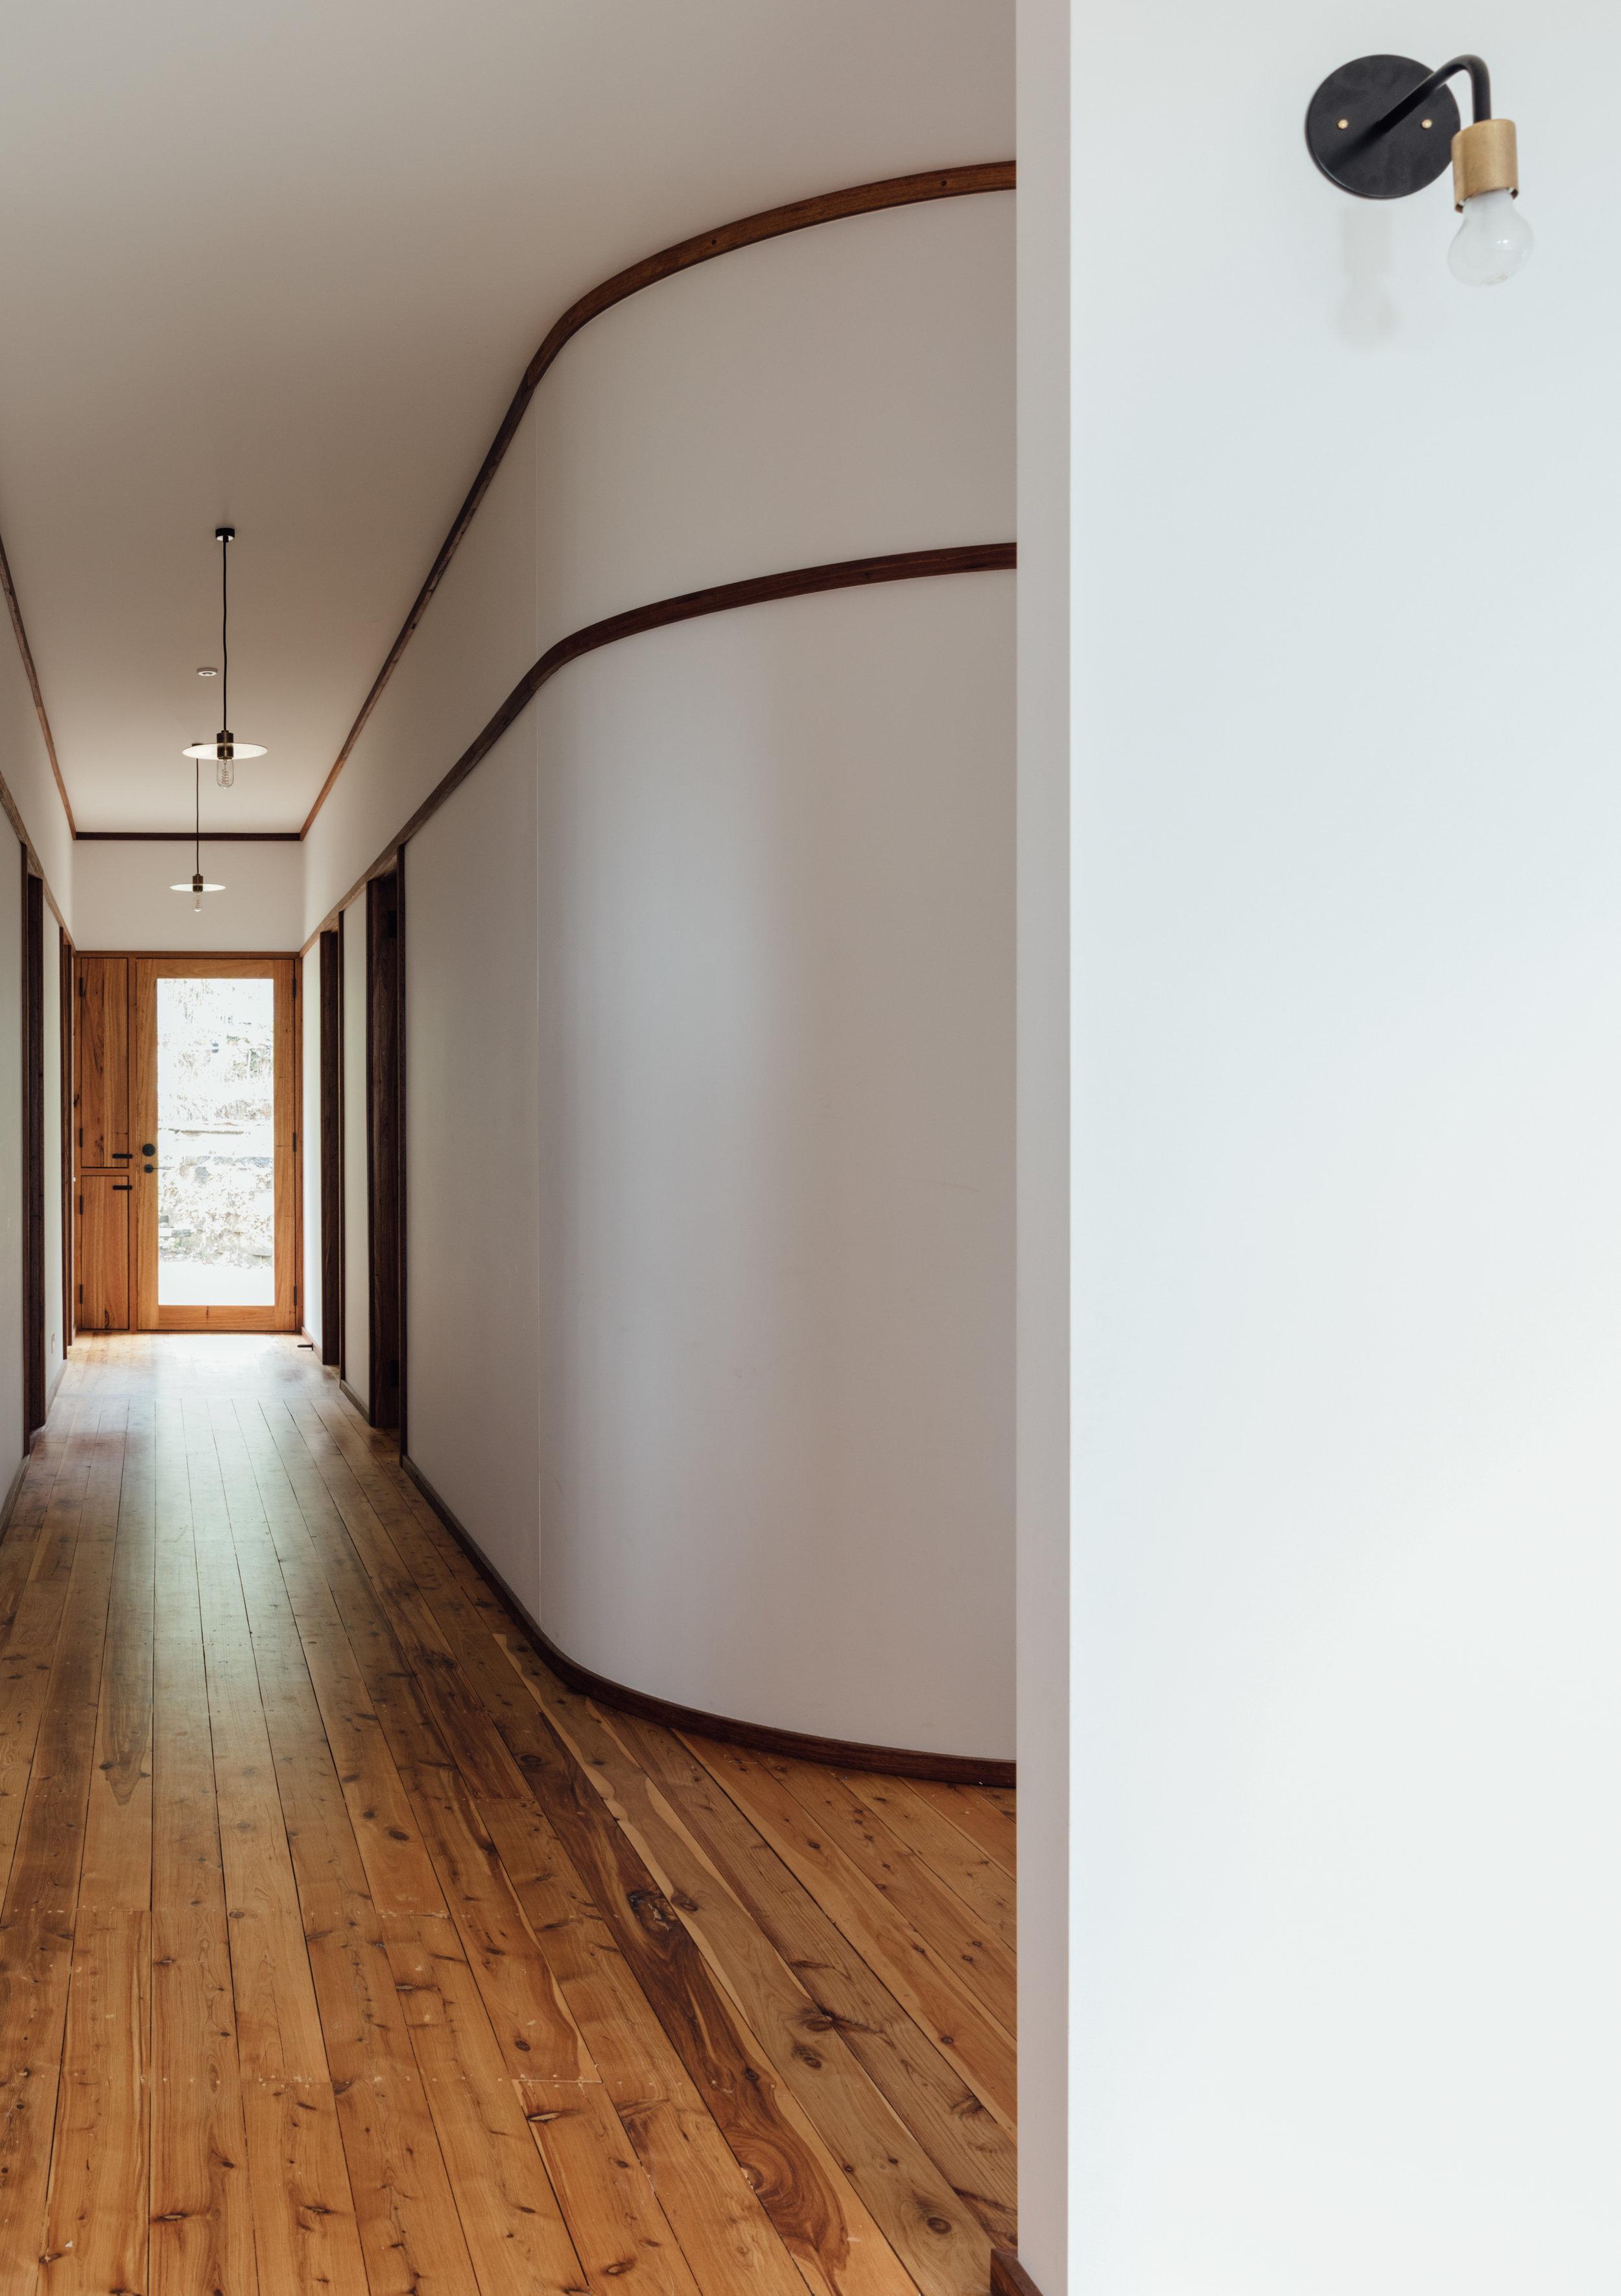 Takt exoskeleton house hallway curved.jpg